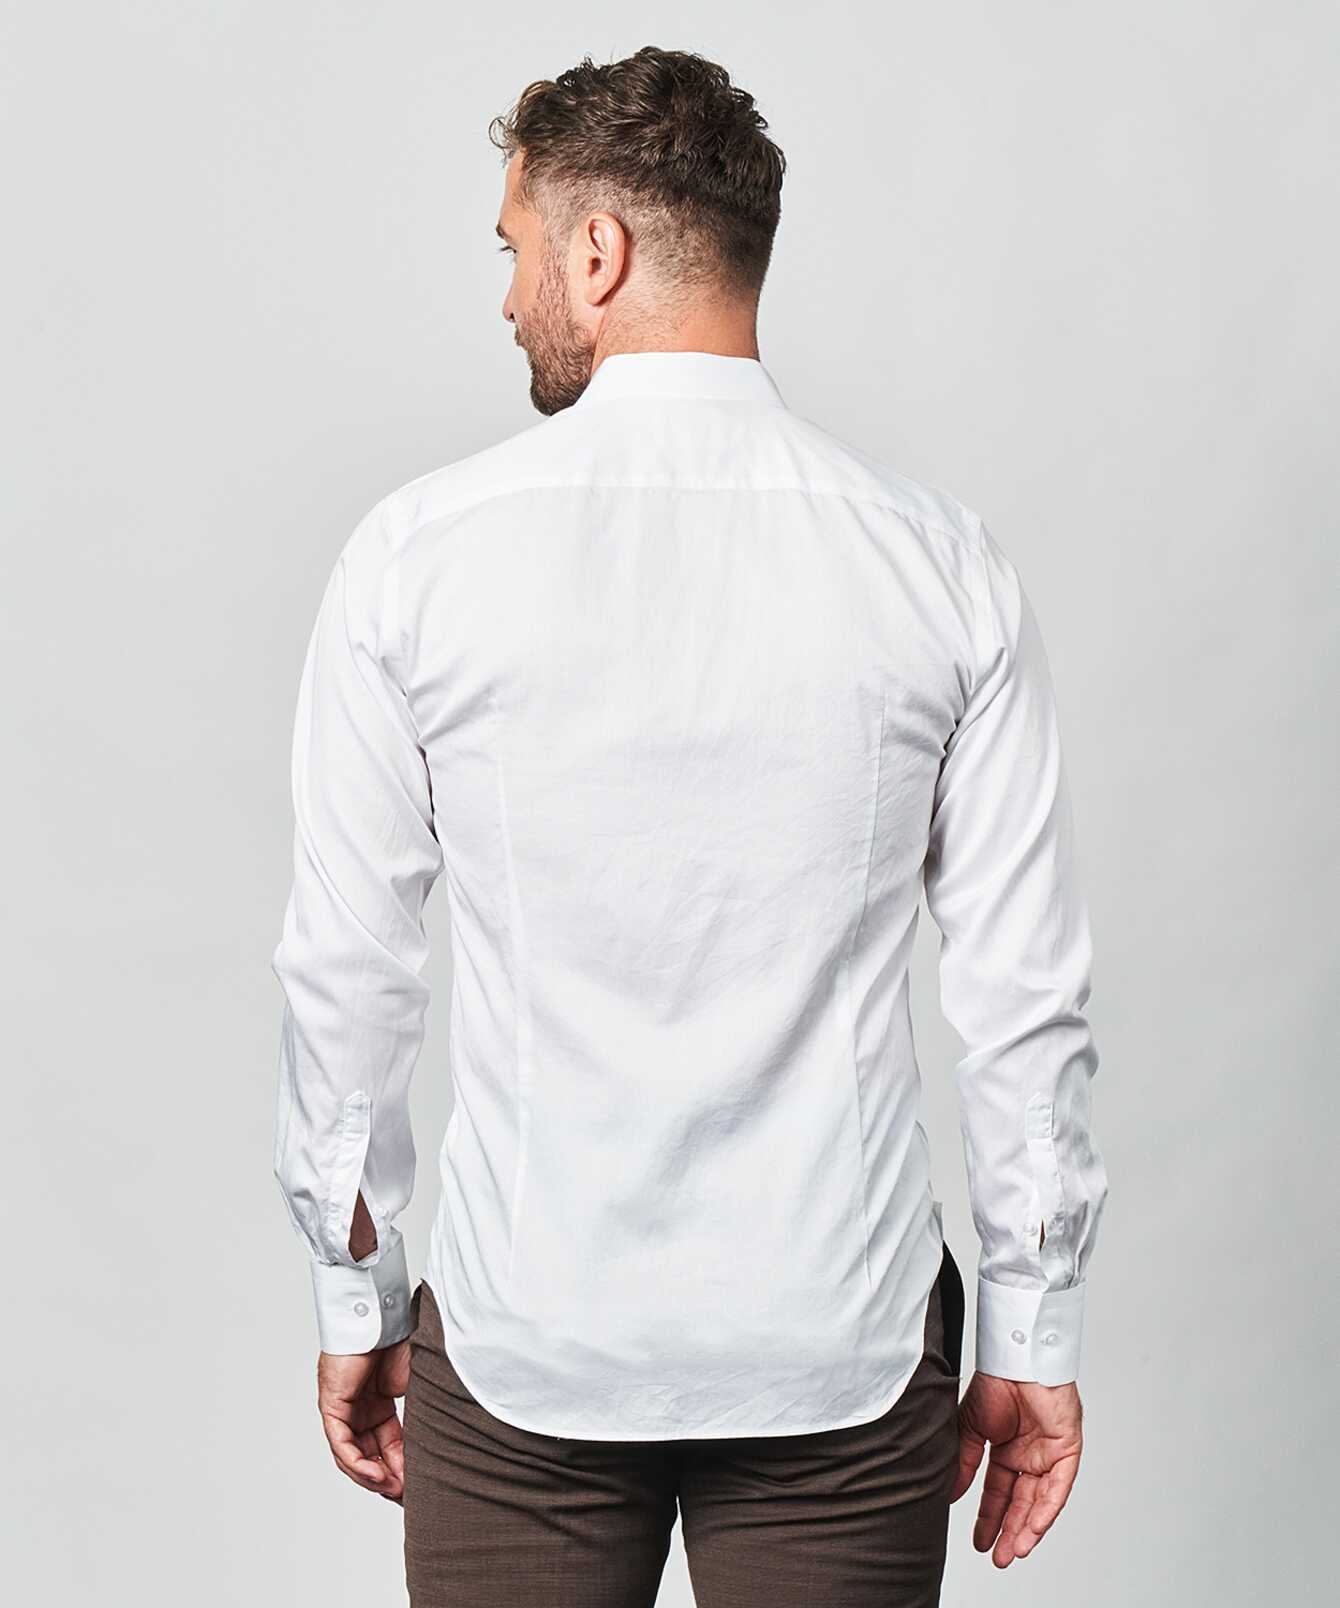 Skjorta Davenport The Shirt Factory